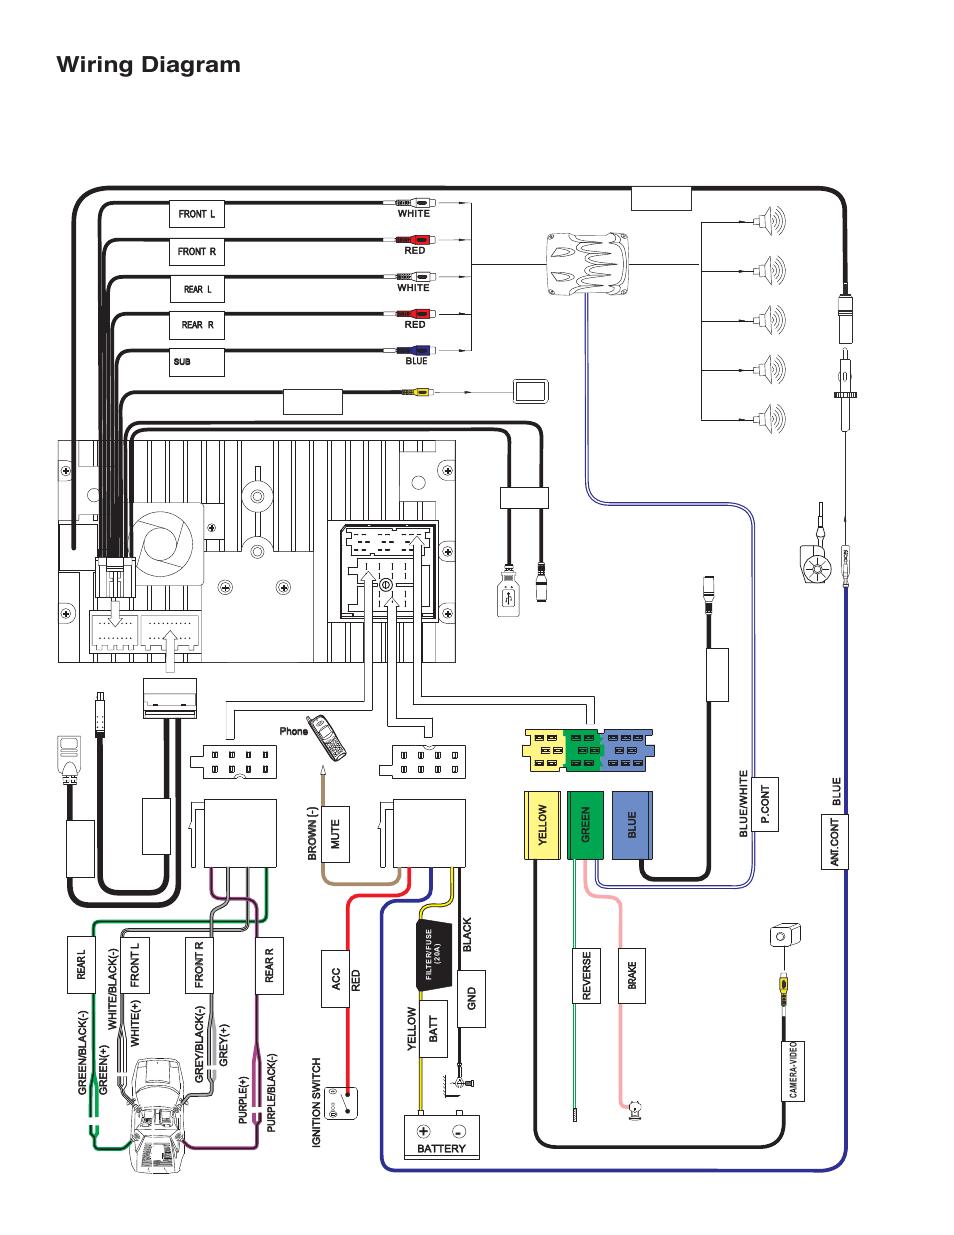 jensen vm9224 page4?resize\\\\\\\=665%2C861 viper 5900 wiring diagram car alarm installation wiring diagrams viper 5002 wiring diagram at soozxer.org